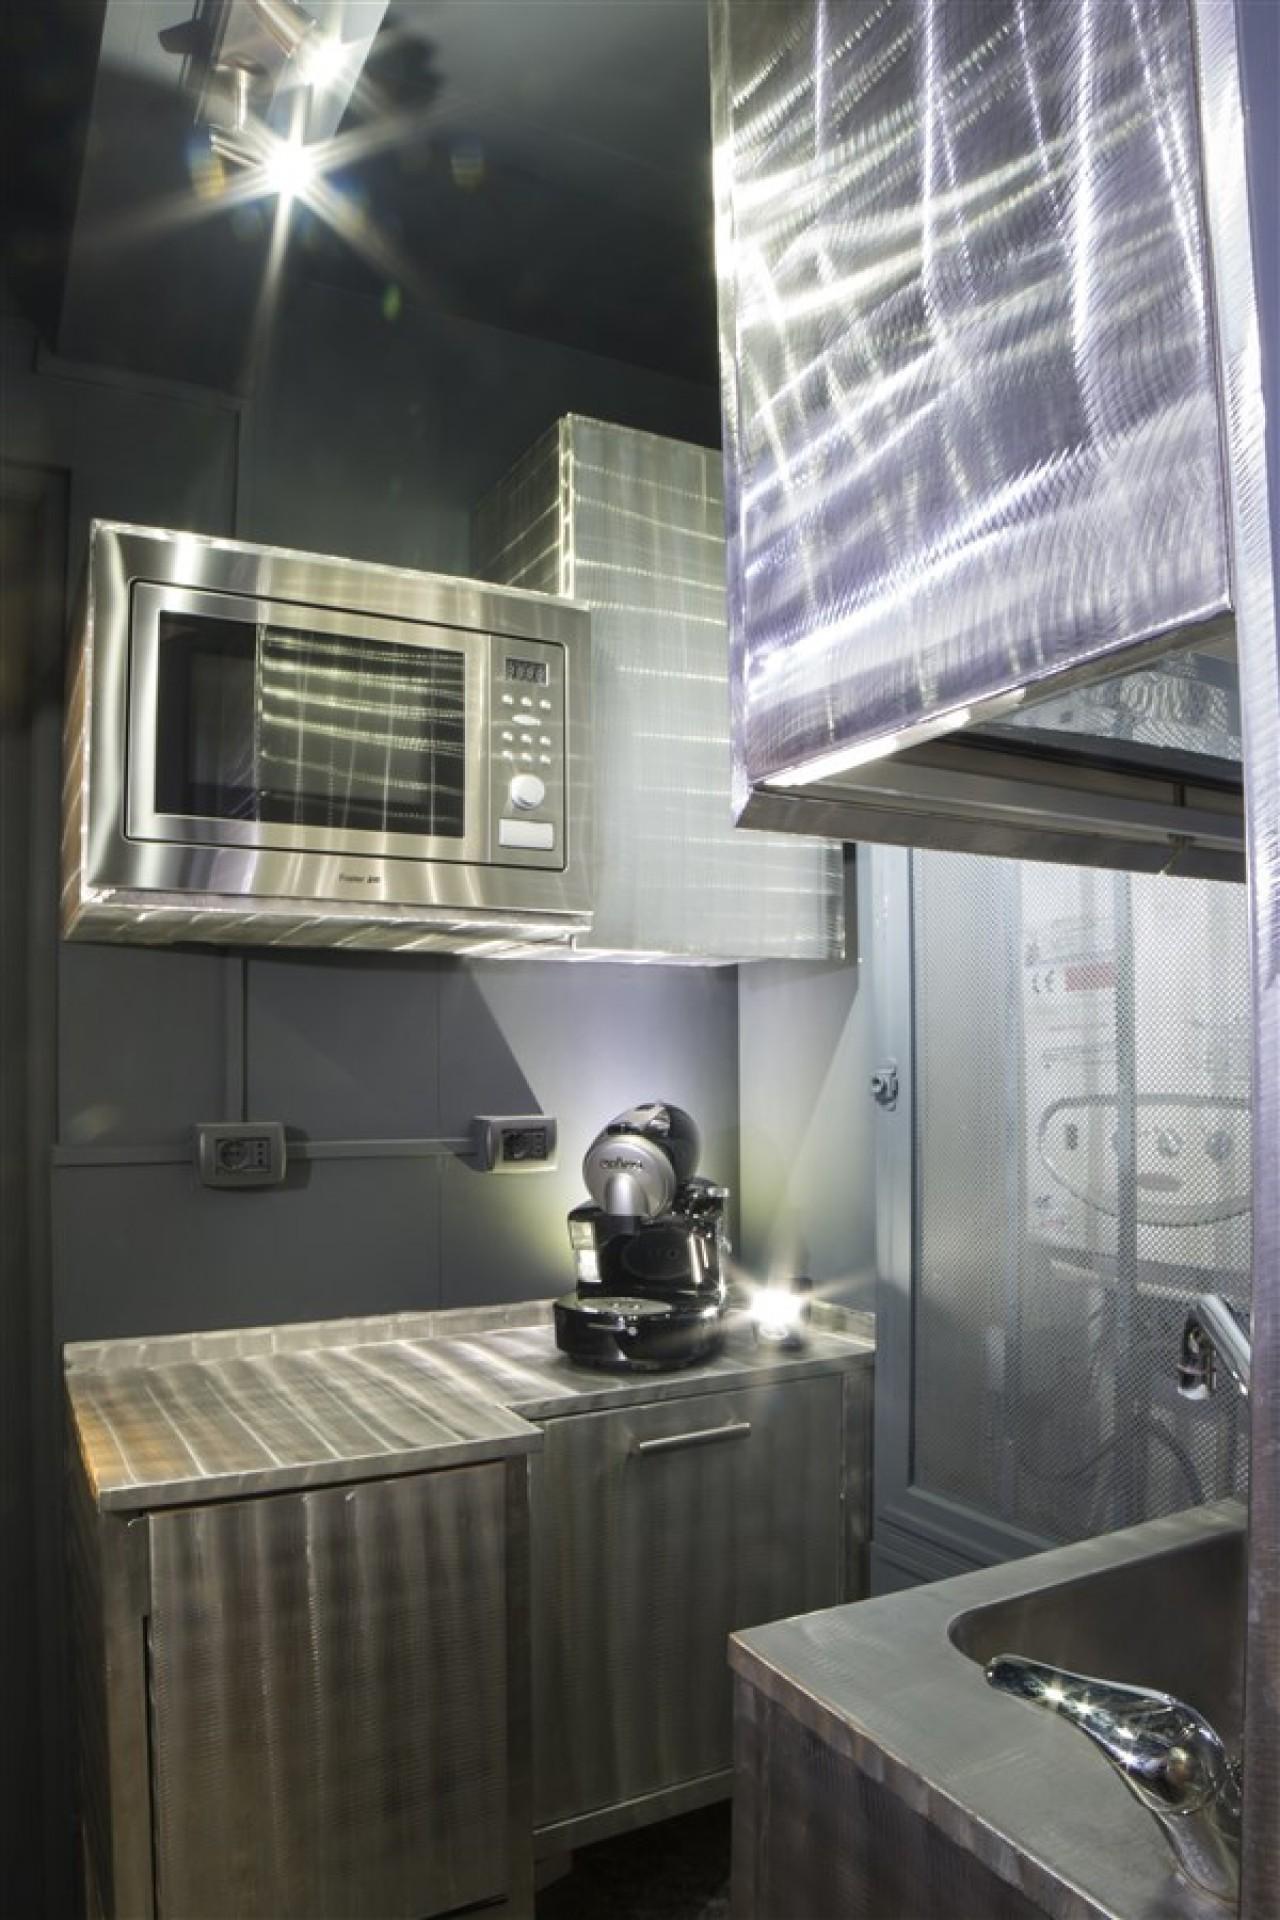 Blocchi cucina acciaio inox spazzolato progetti borlina acciaio - Cucina in acciaio inox ...